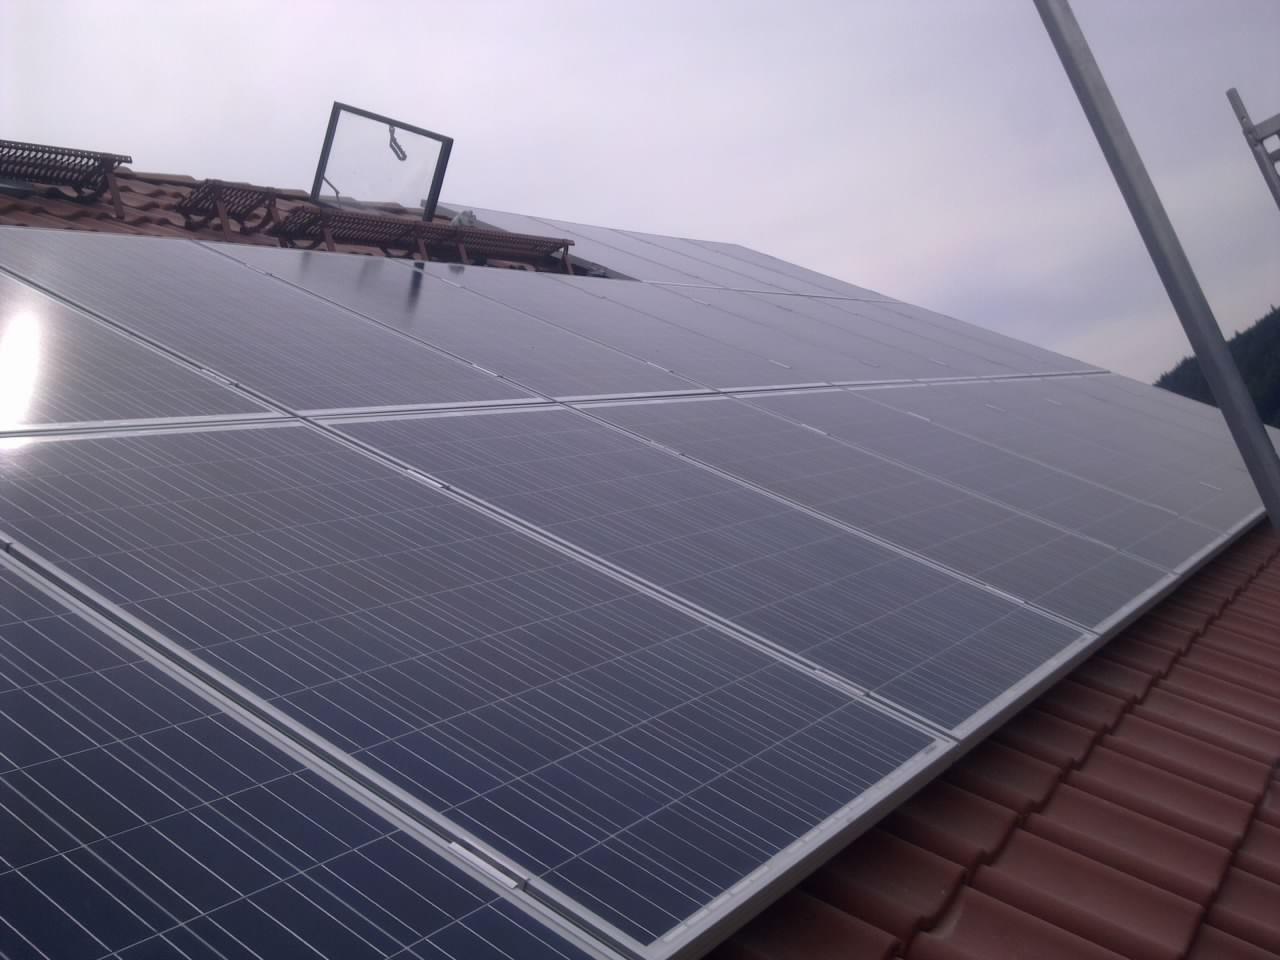 93164 Duggendorf 6 kWp Photovoltaikanlage